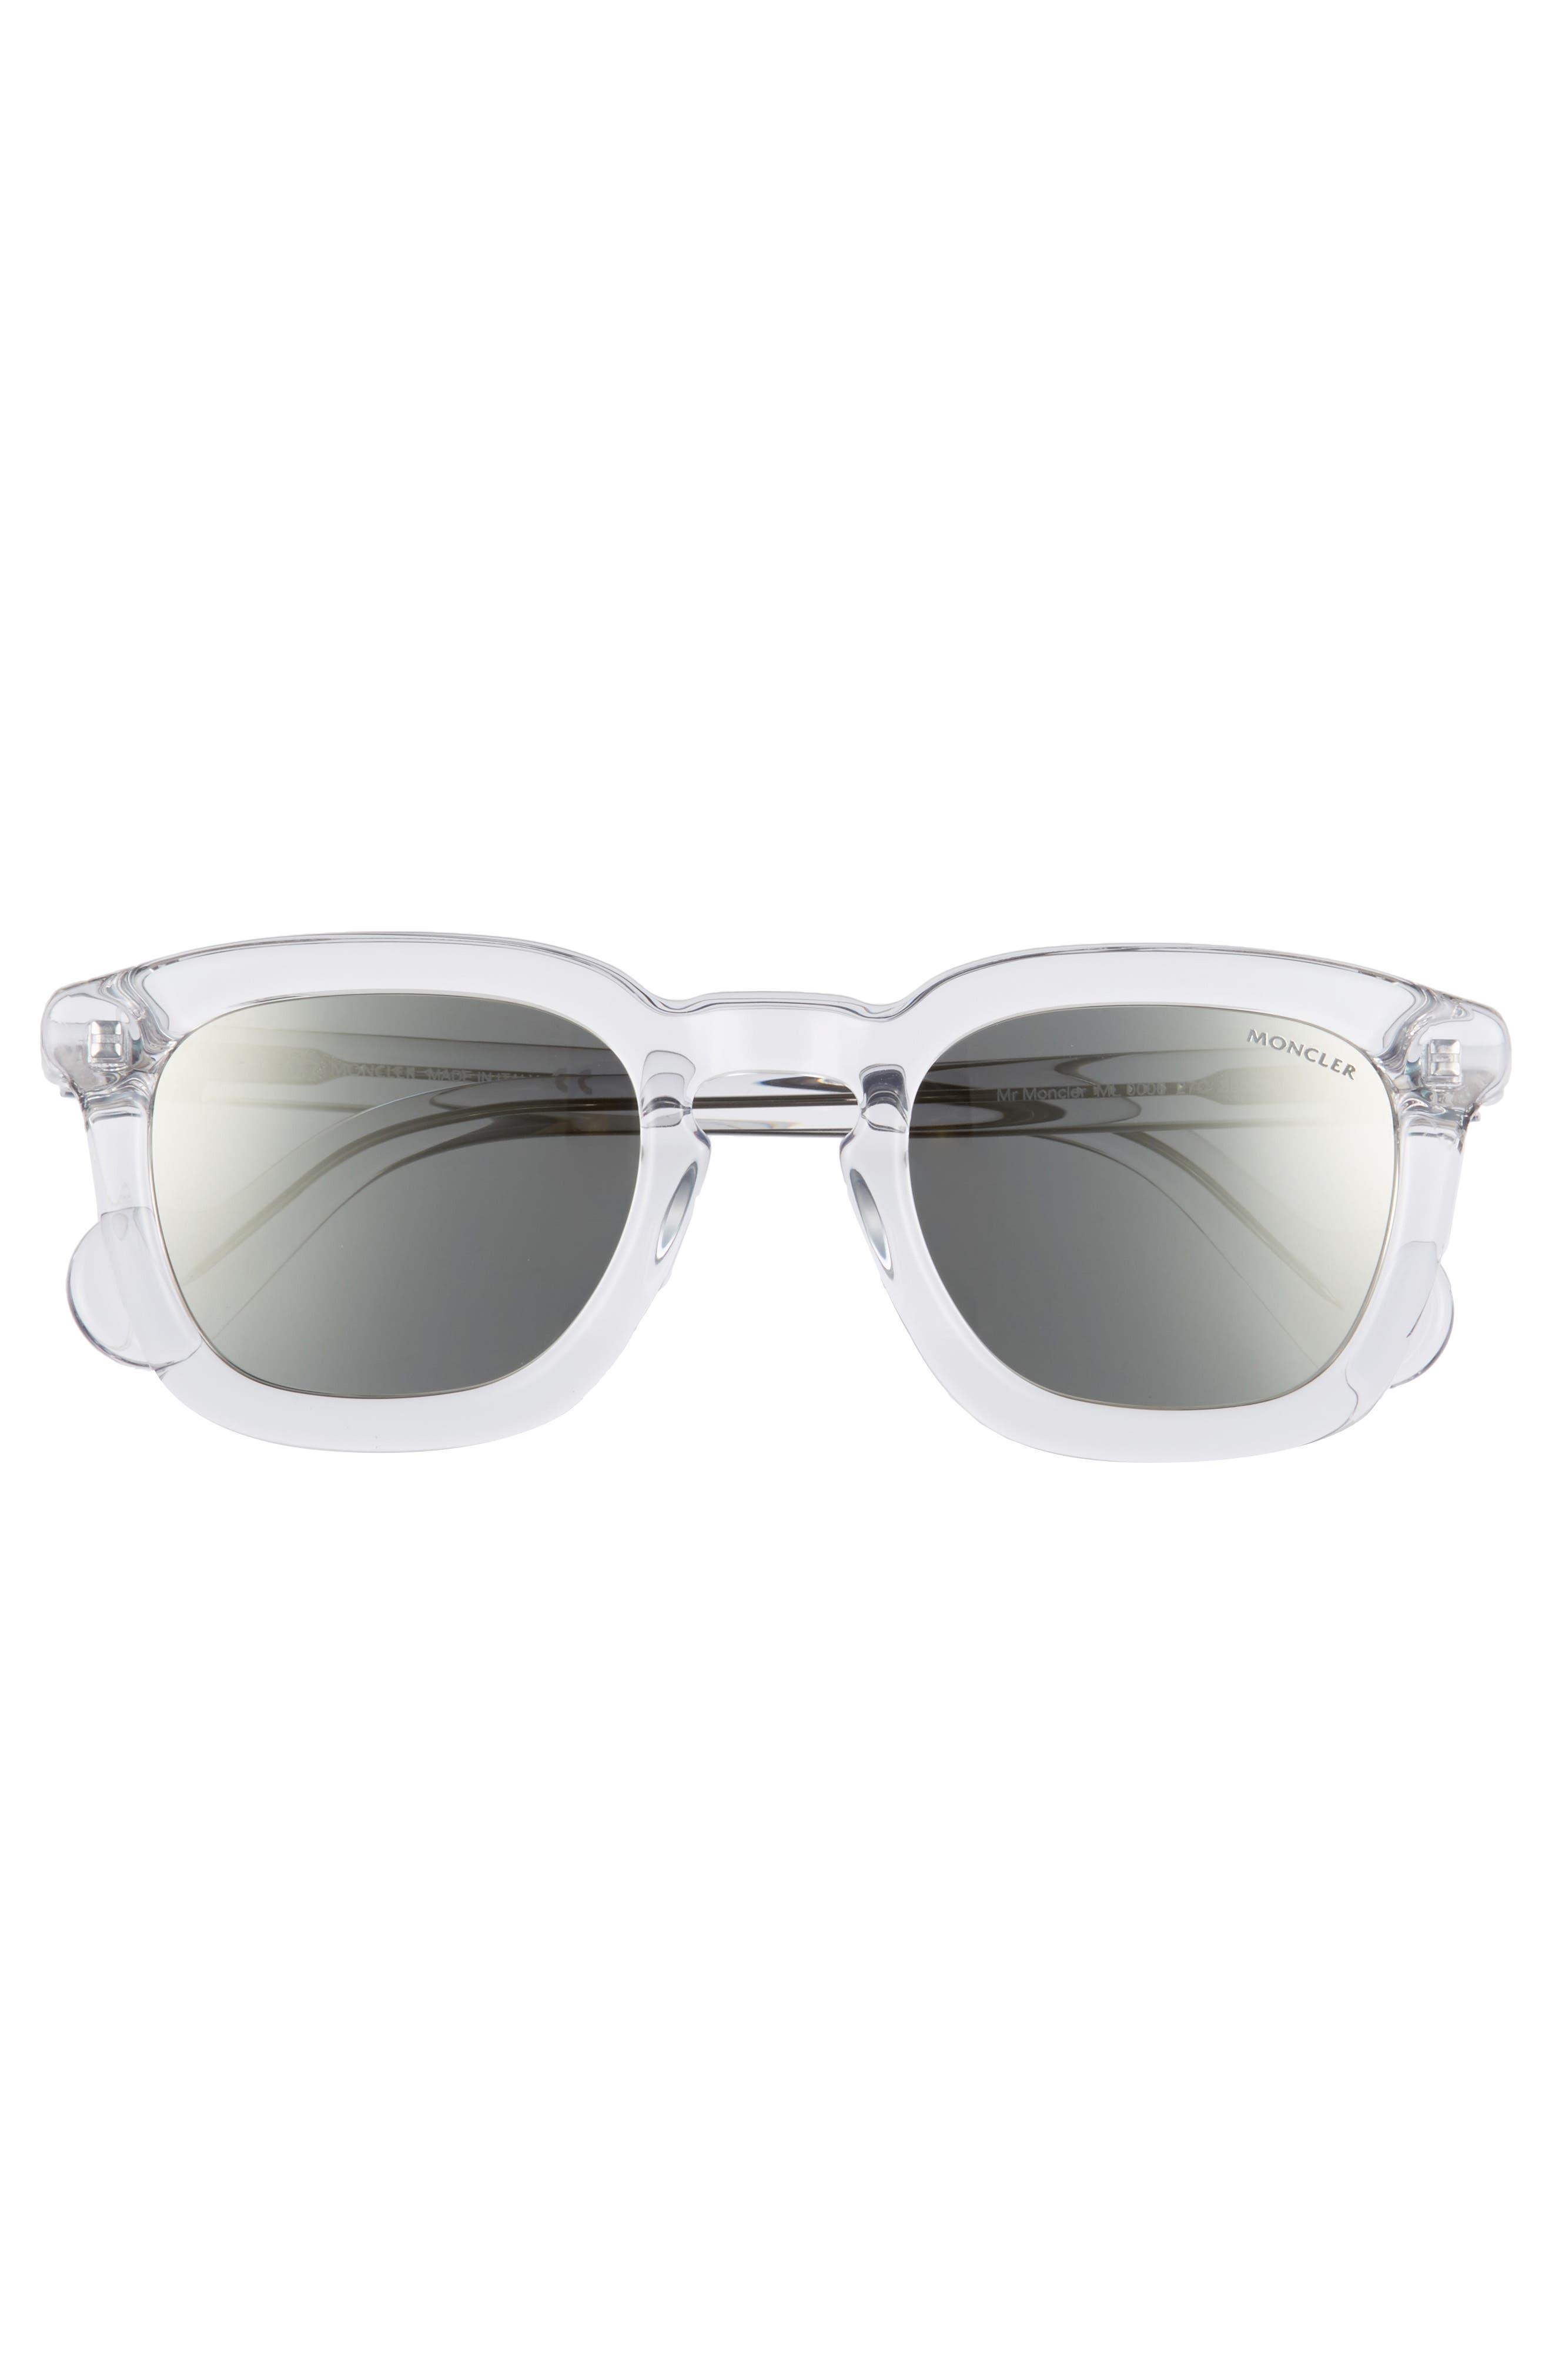 50mm Square Sunglasses,                             Alternate thumbnail 6, color,